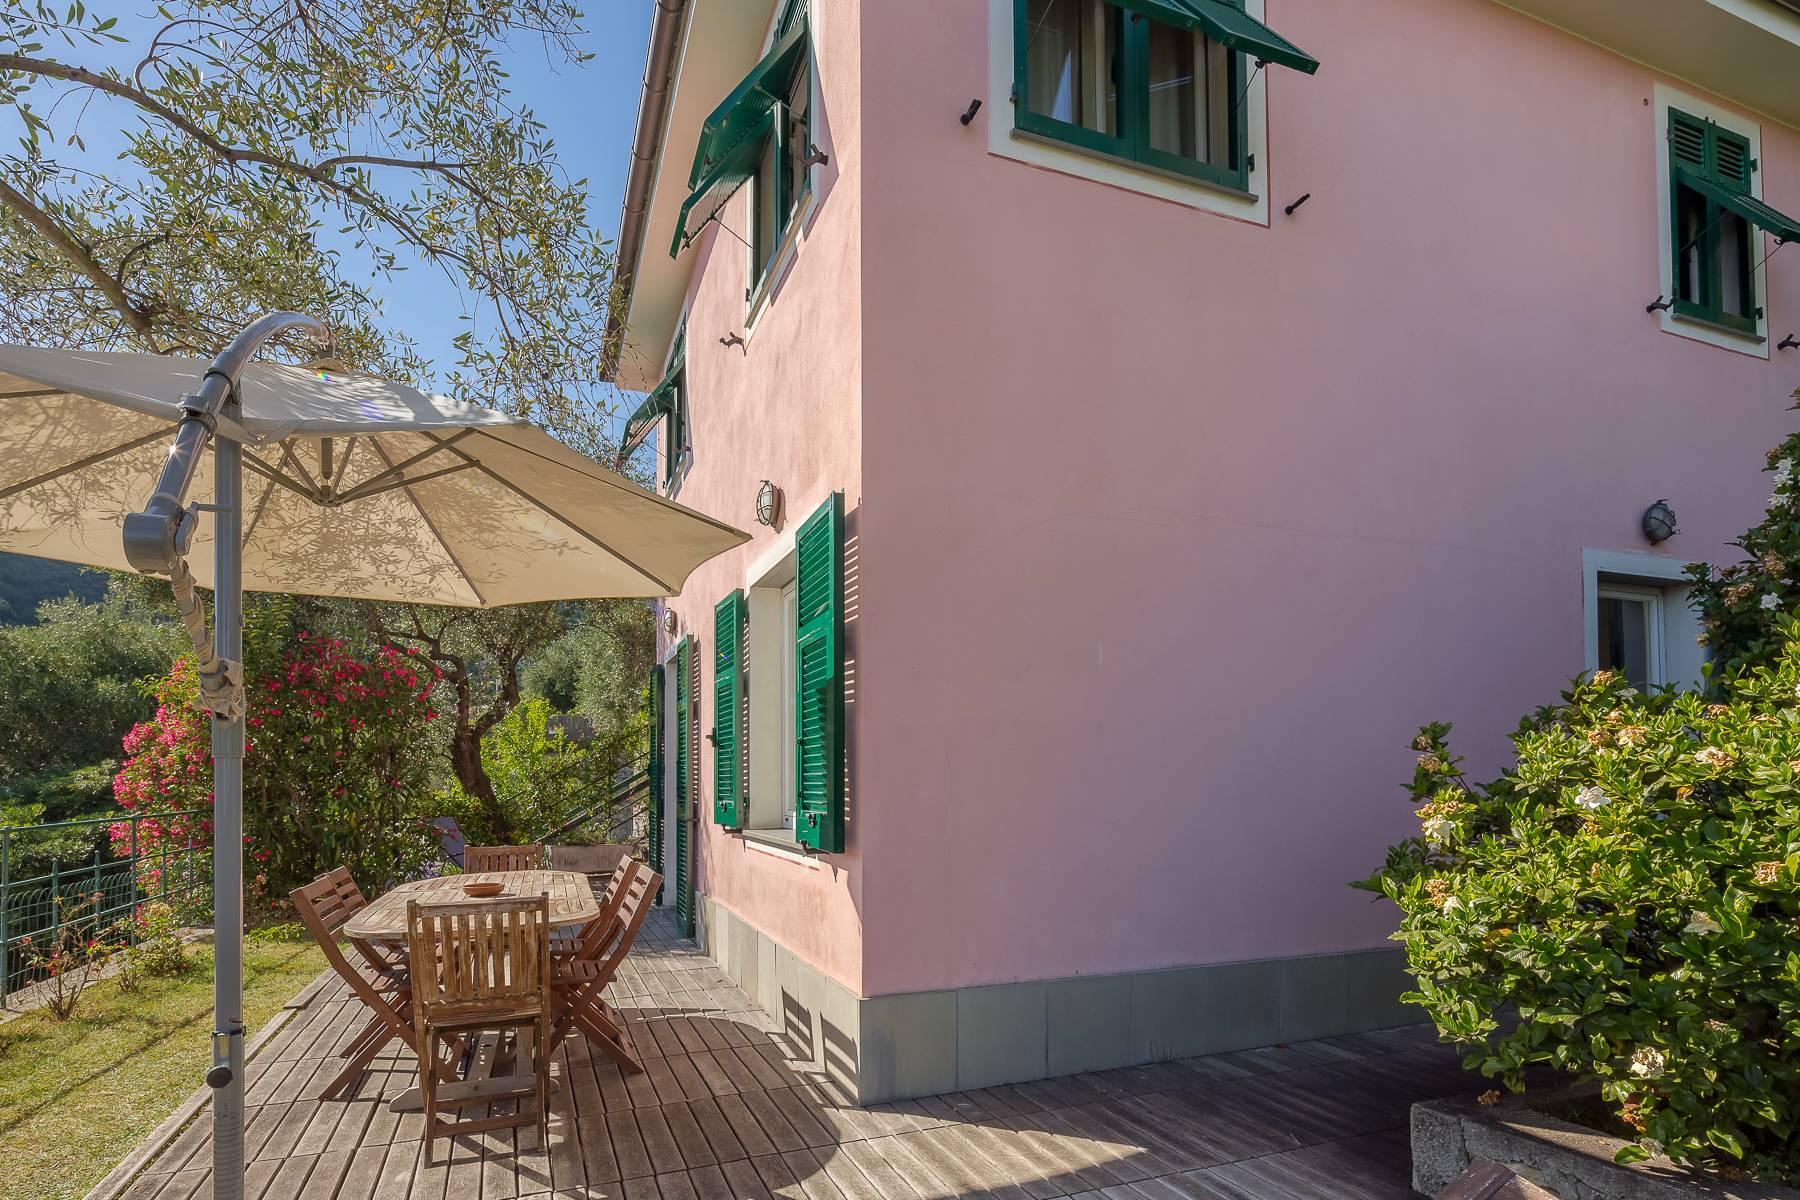 Casa indipendente in Vendita a Zoagli: 5 locali, 100 mq - Foto 4